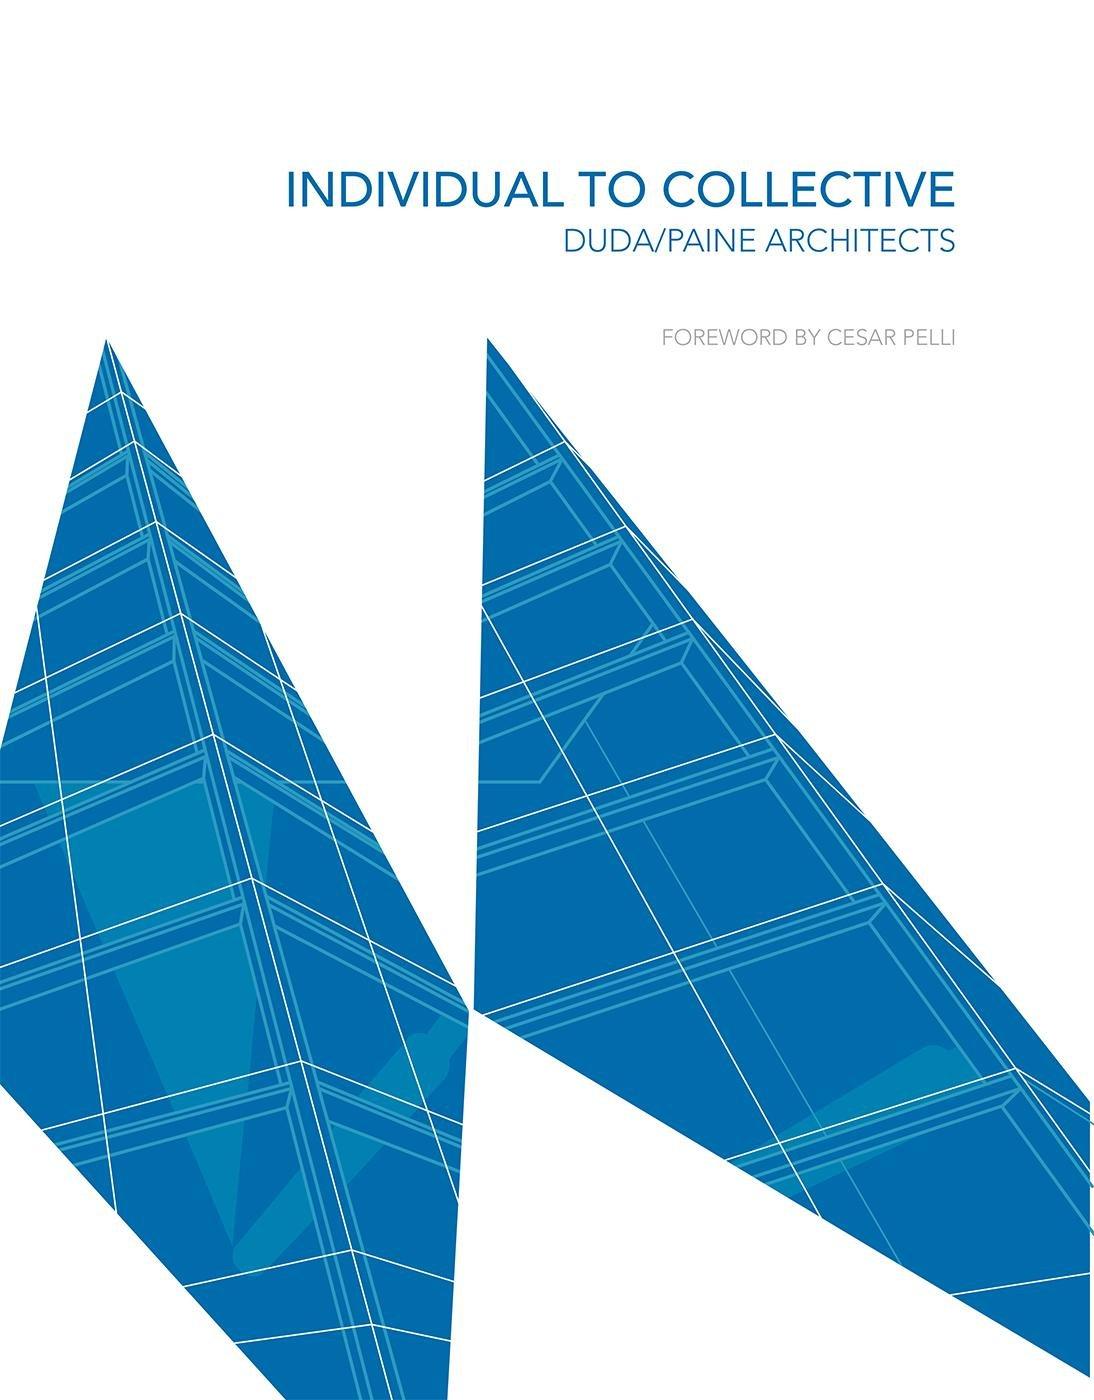 Individual To Collective Duda Paine Architects Amazon Es Duda Paine Pelli Libros En Idiomas Extranjeros